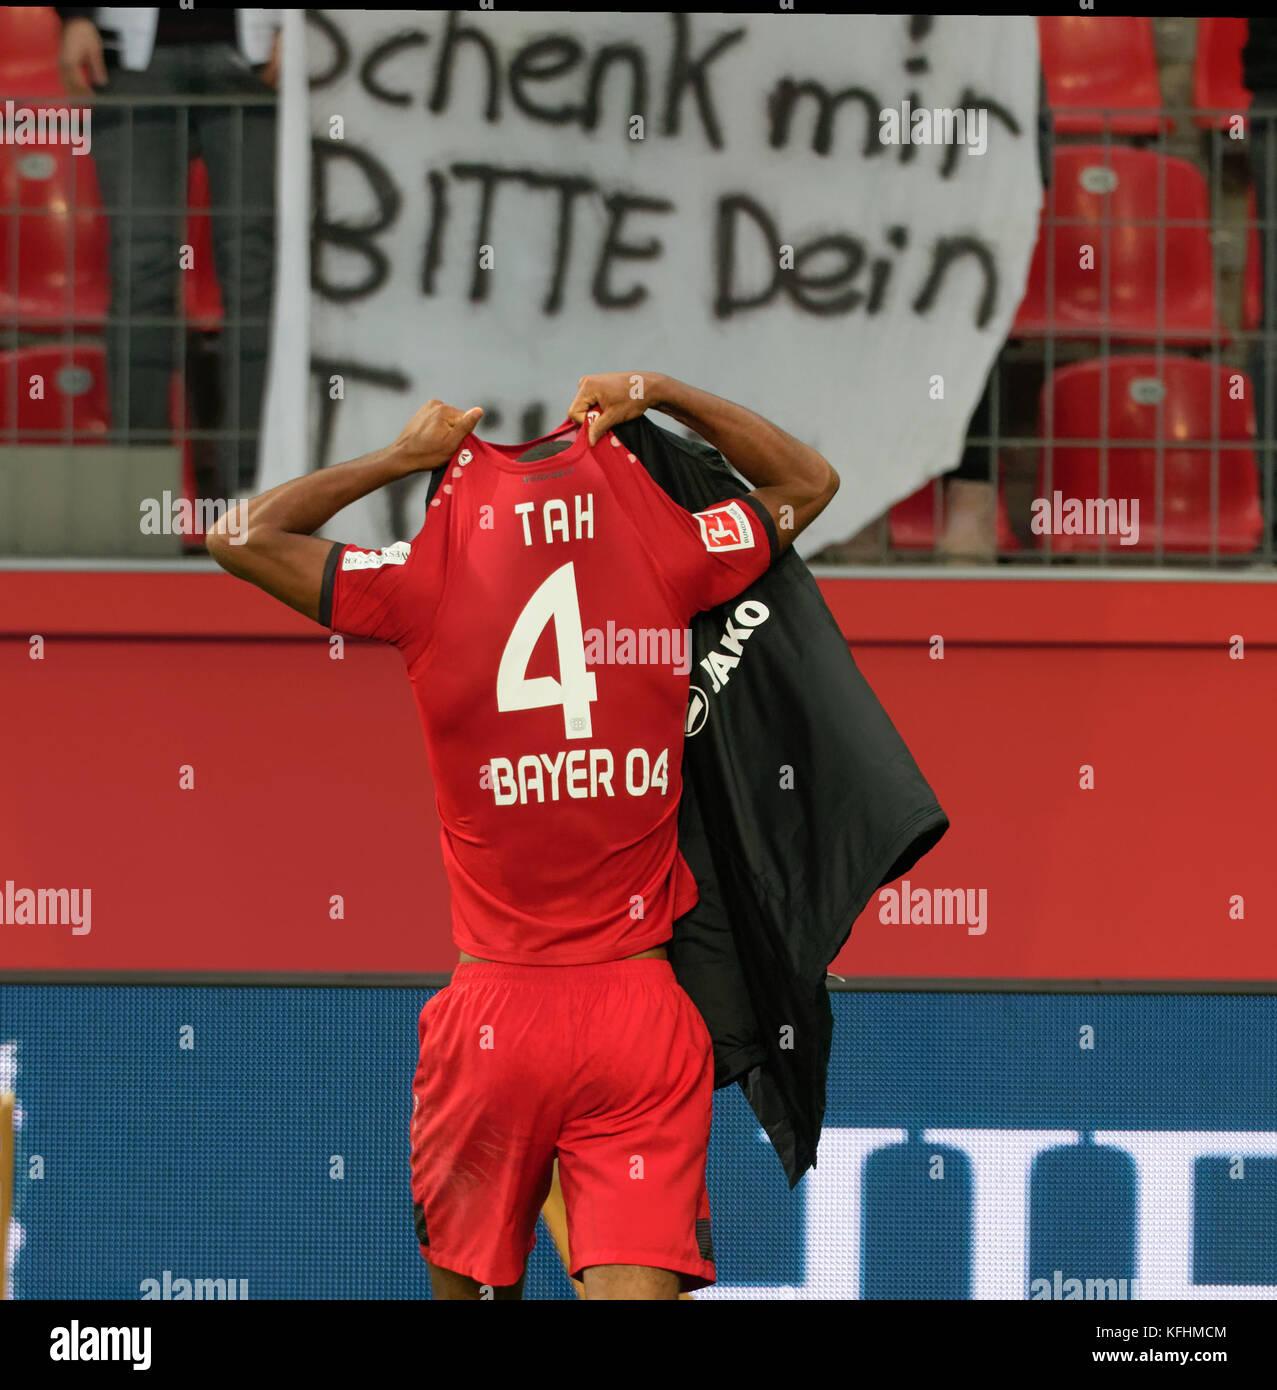 Leverkusen, Germany October 28 2017, Bundesliga matchday 10, Bayer 04 Leverkusen vs 1. FC Koeln: Jonathan Tah (B04) - Stock Image